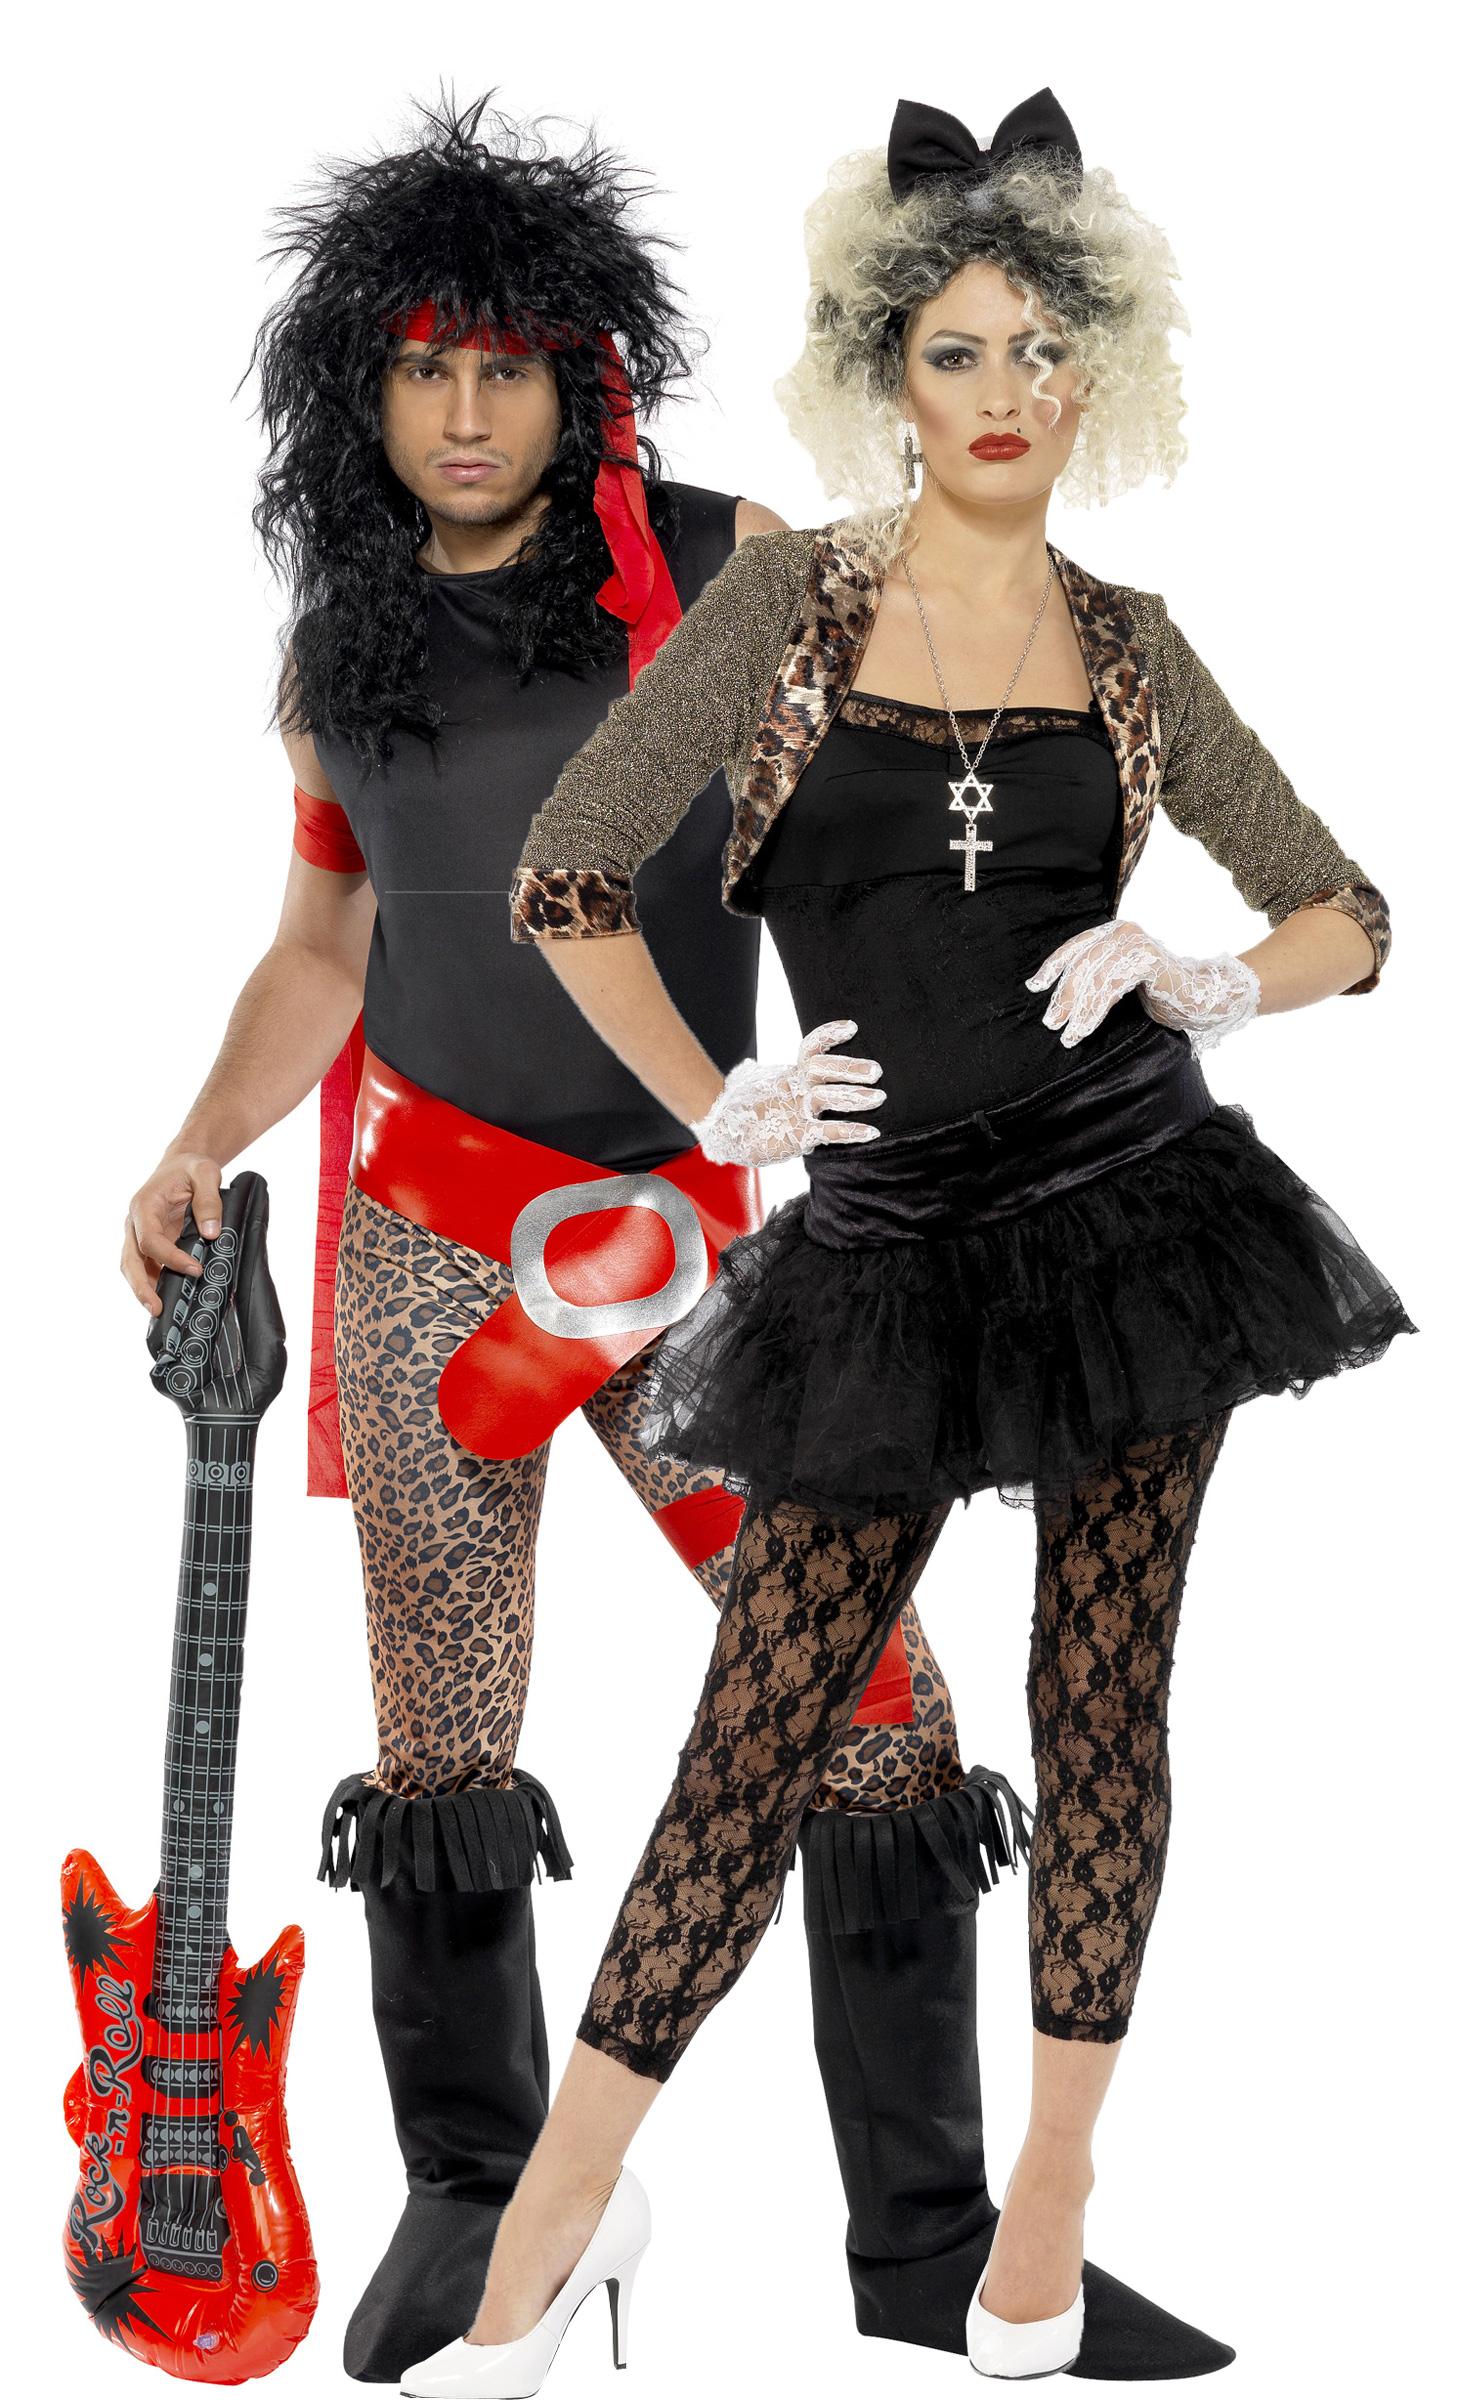 80 39 s rock costume for couple. Black Bedroom Furniture Sets. Home Design Ideas